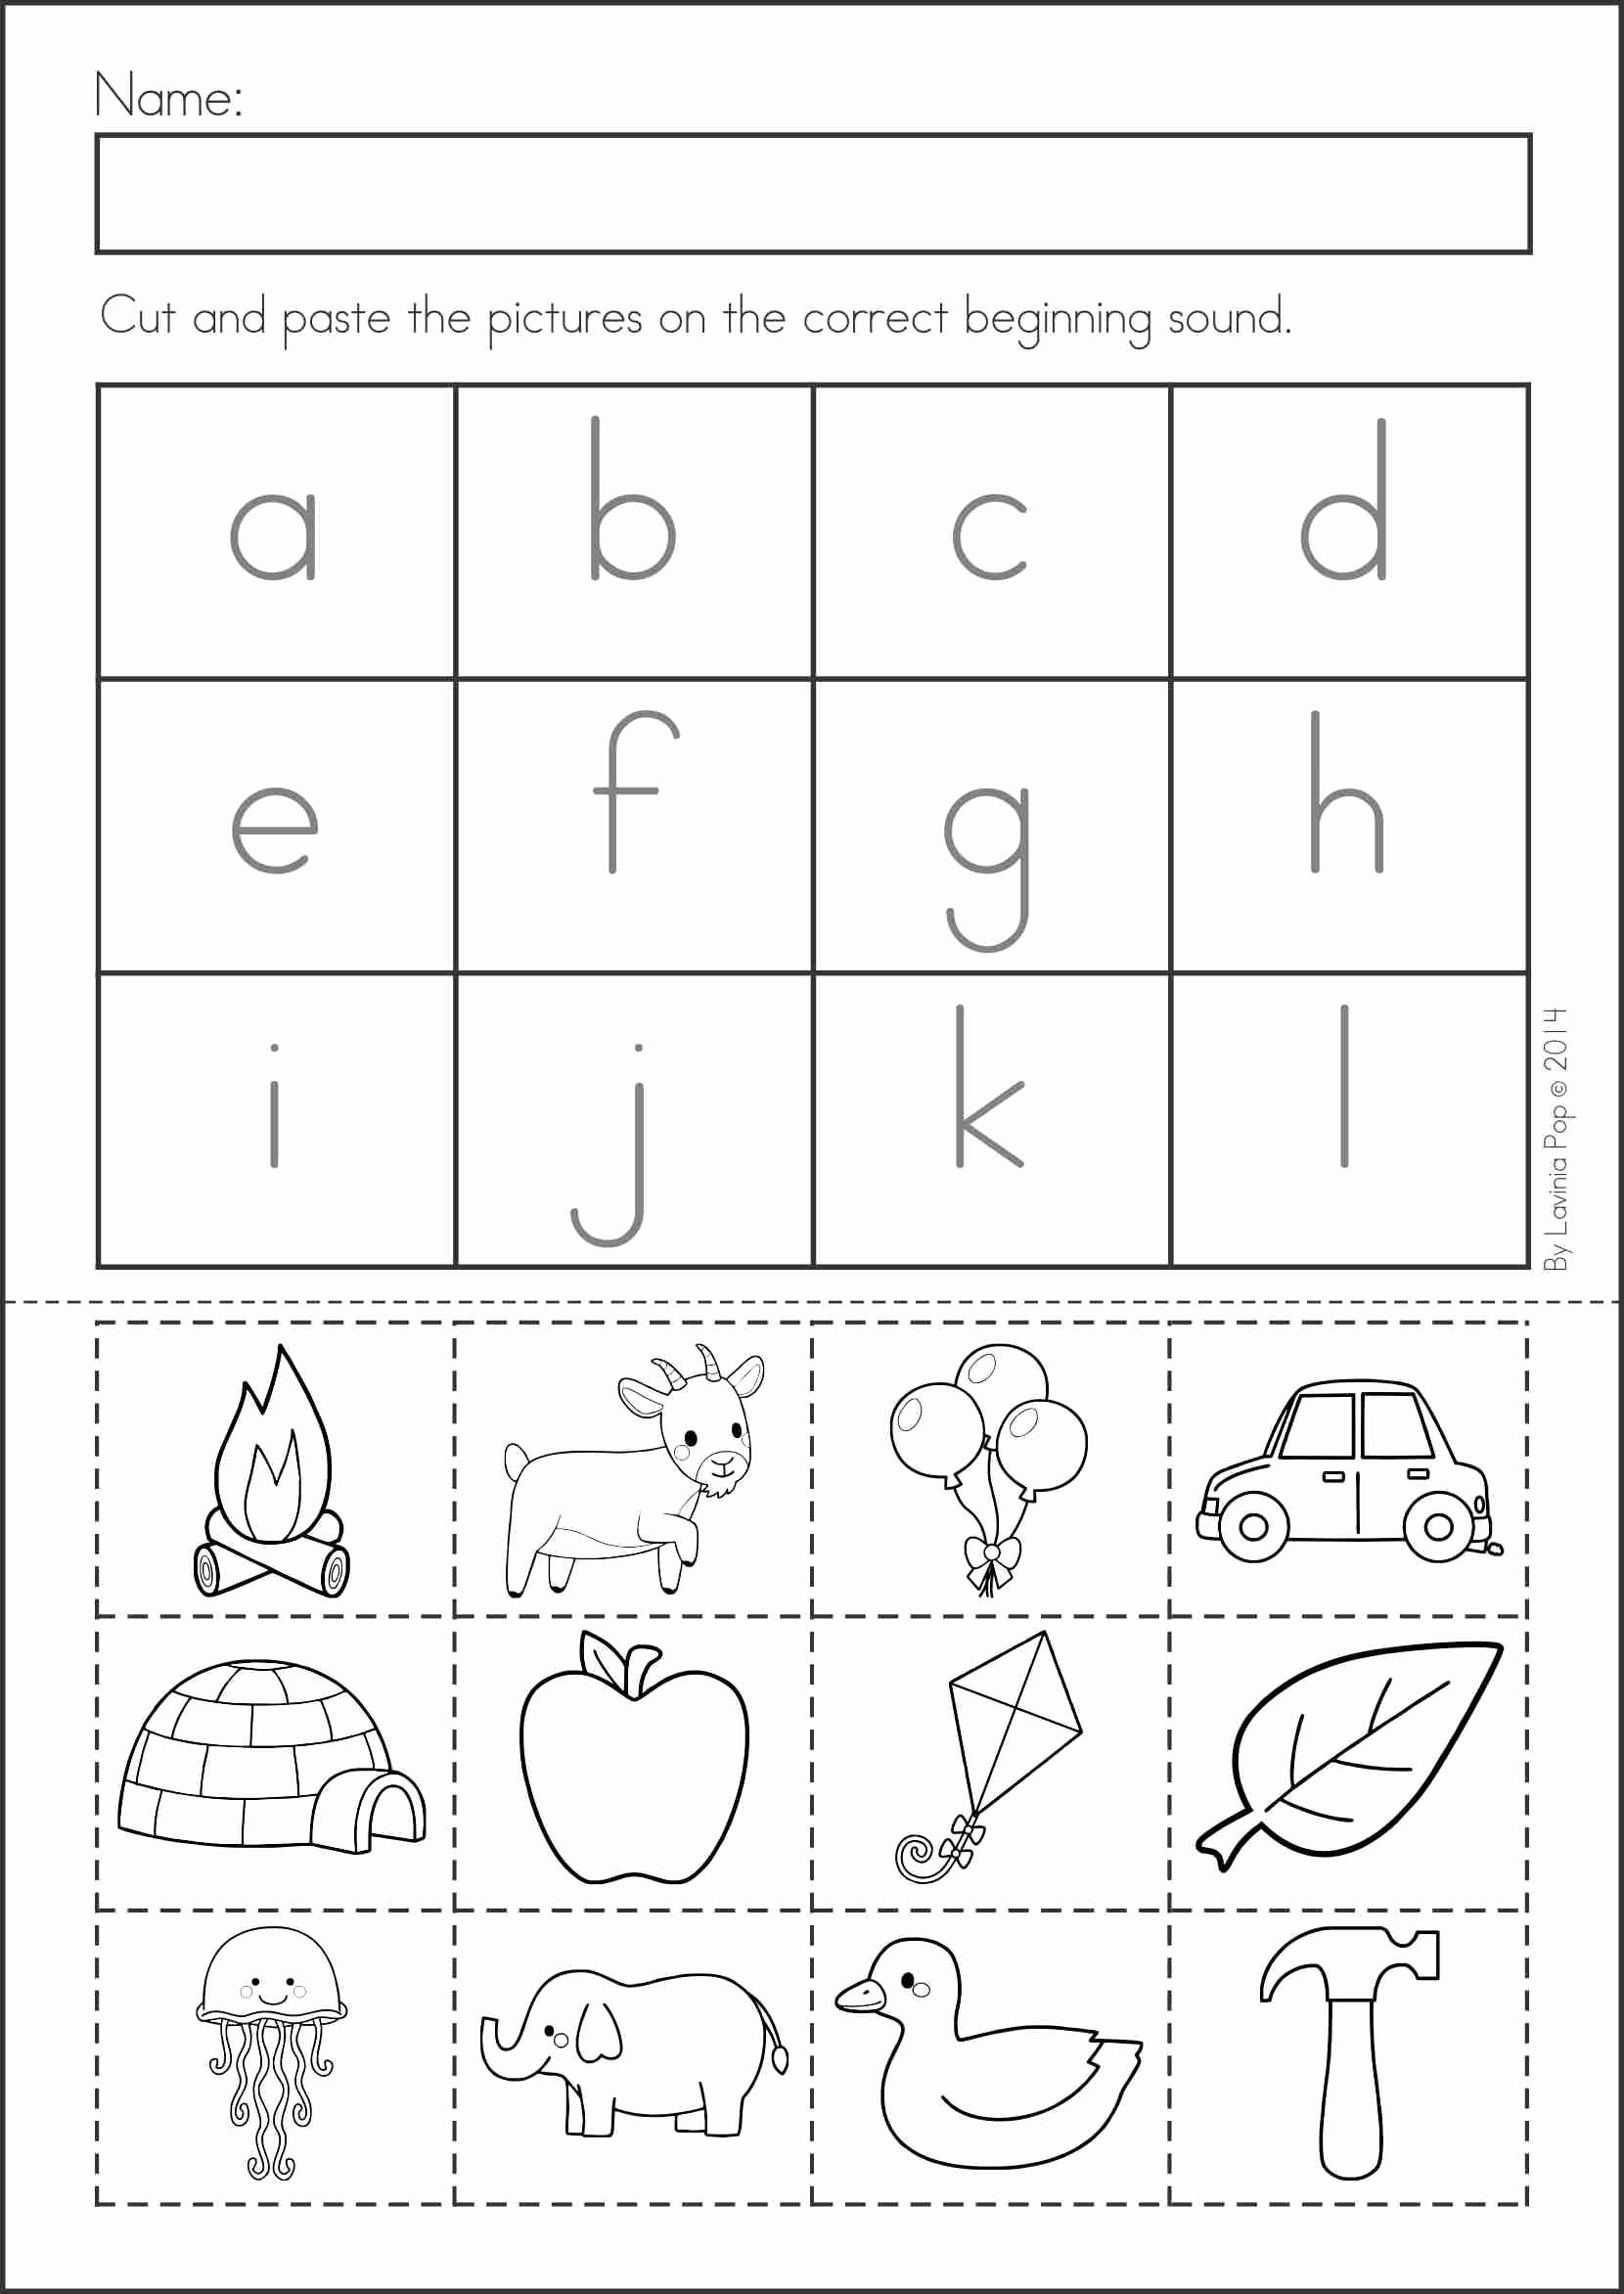 Literacy Worksheets for Preschoolers Fresh Summer Review Kindergarten Math & Literacy Worksheets